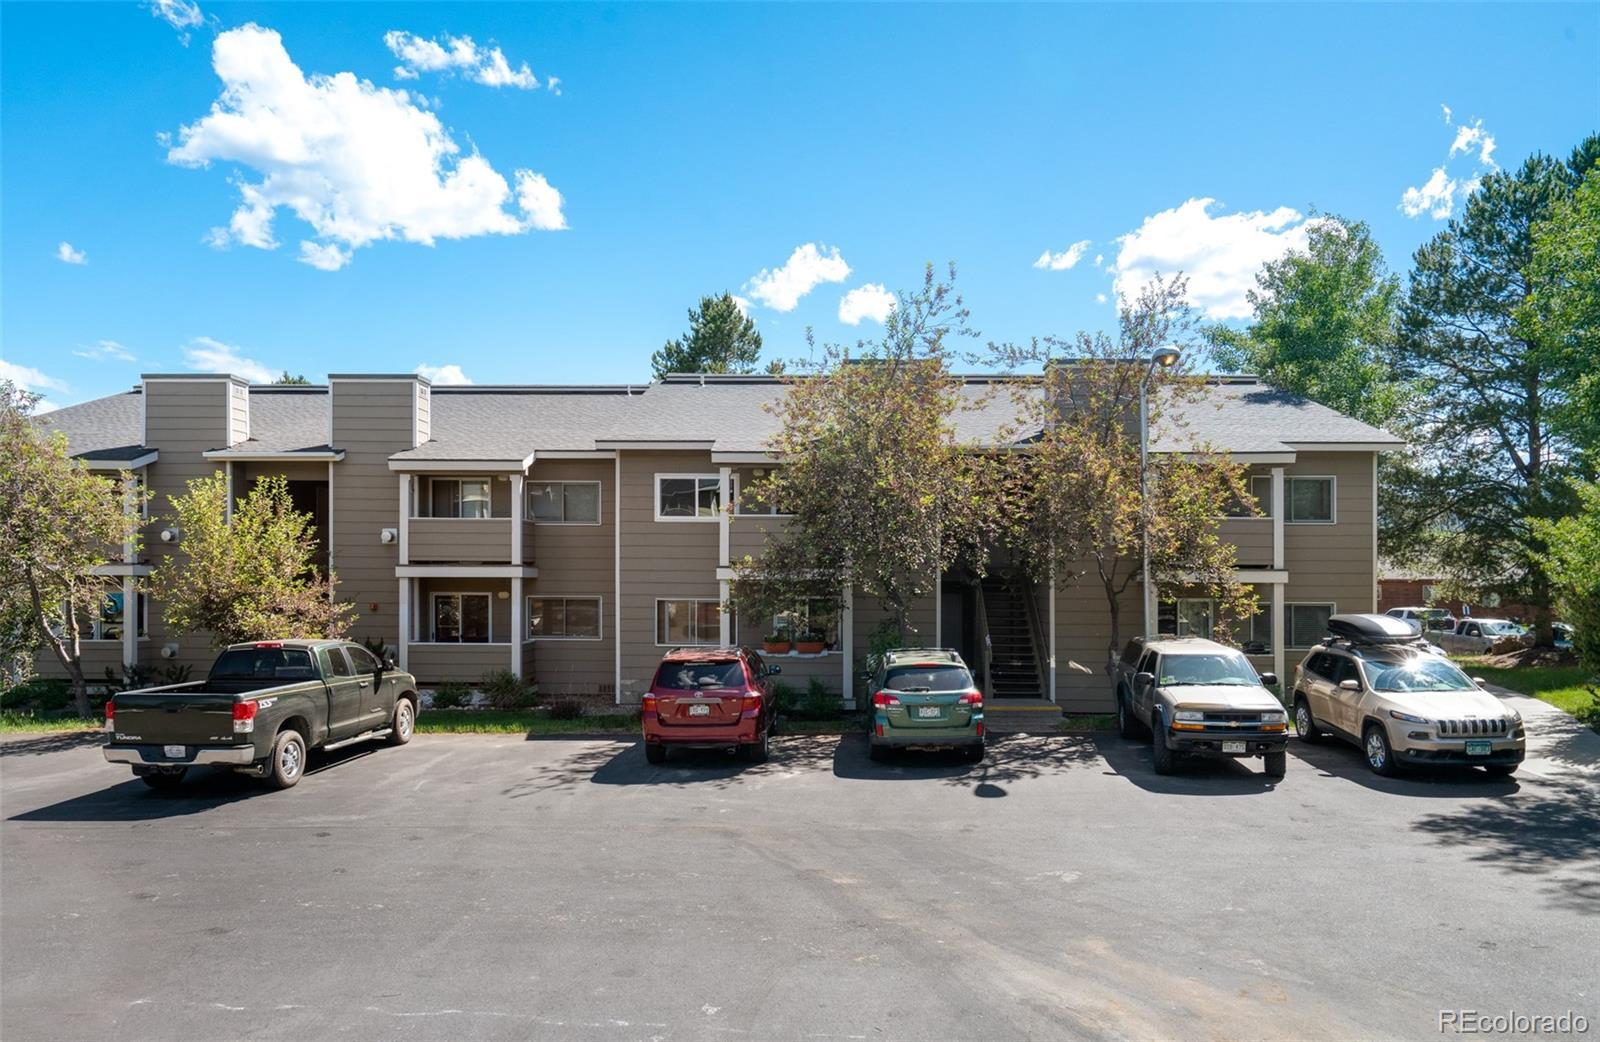 MLS# 5816259 - 1 - 1385 Sparta Plaza #7, Steamboat Springs, CO 80487